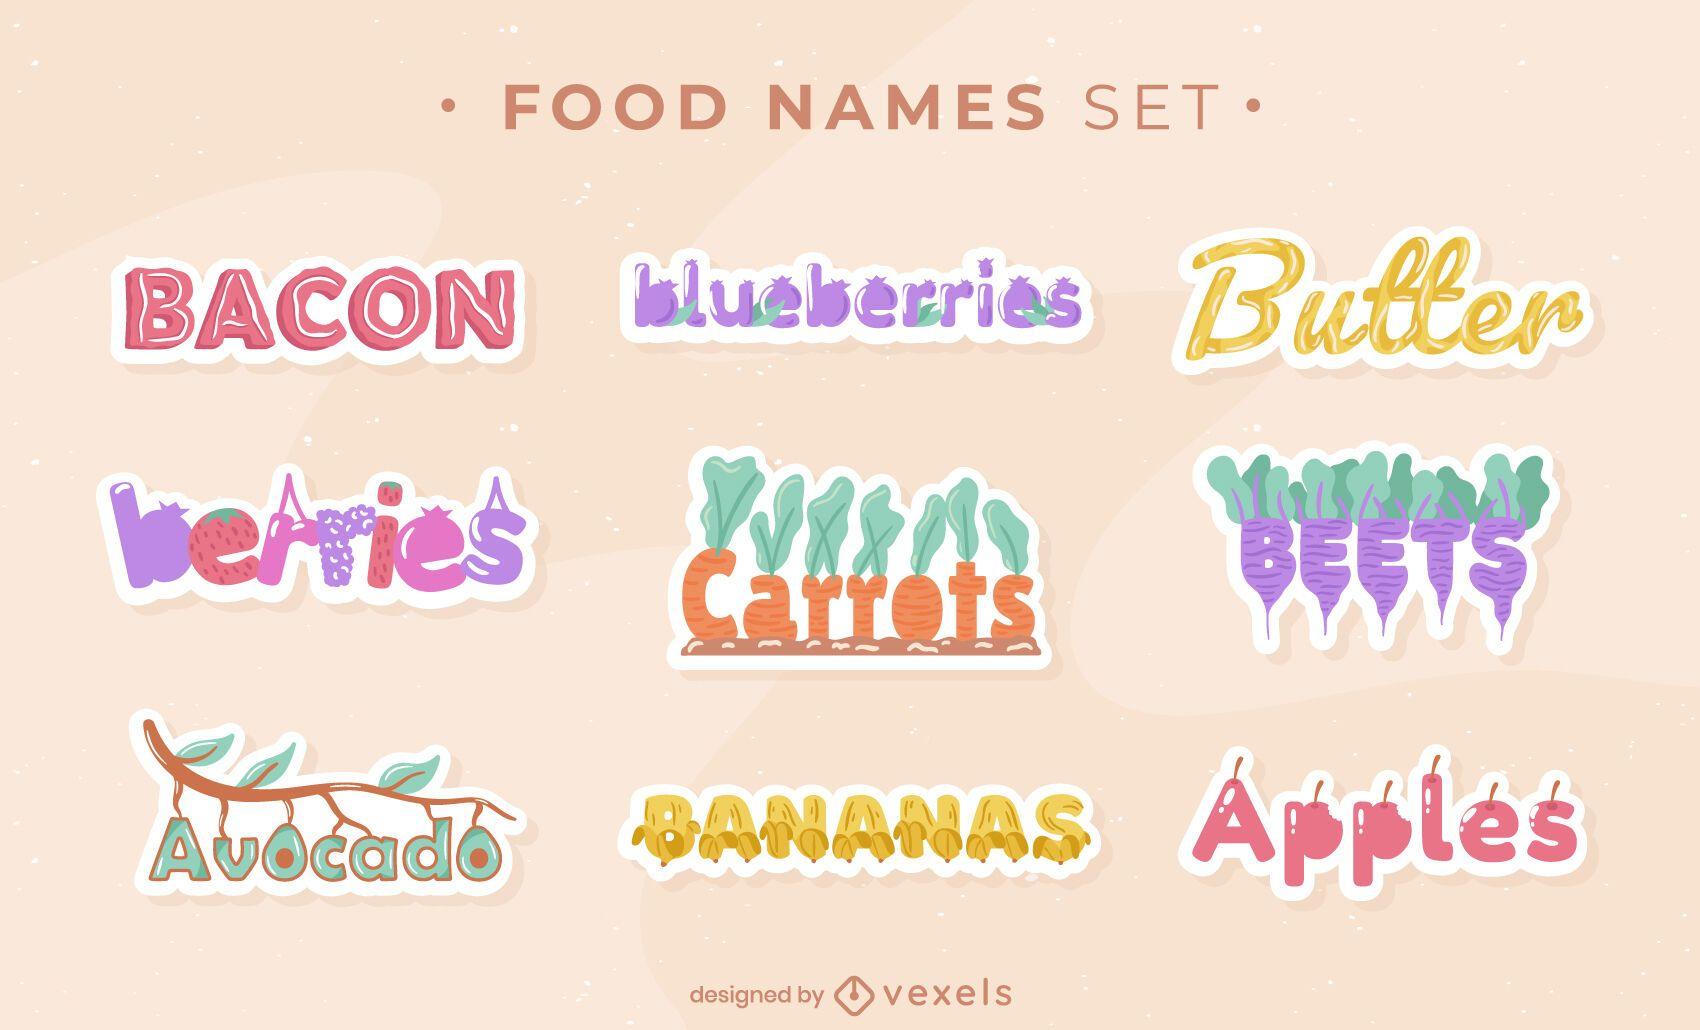 Food names sticker set